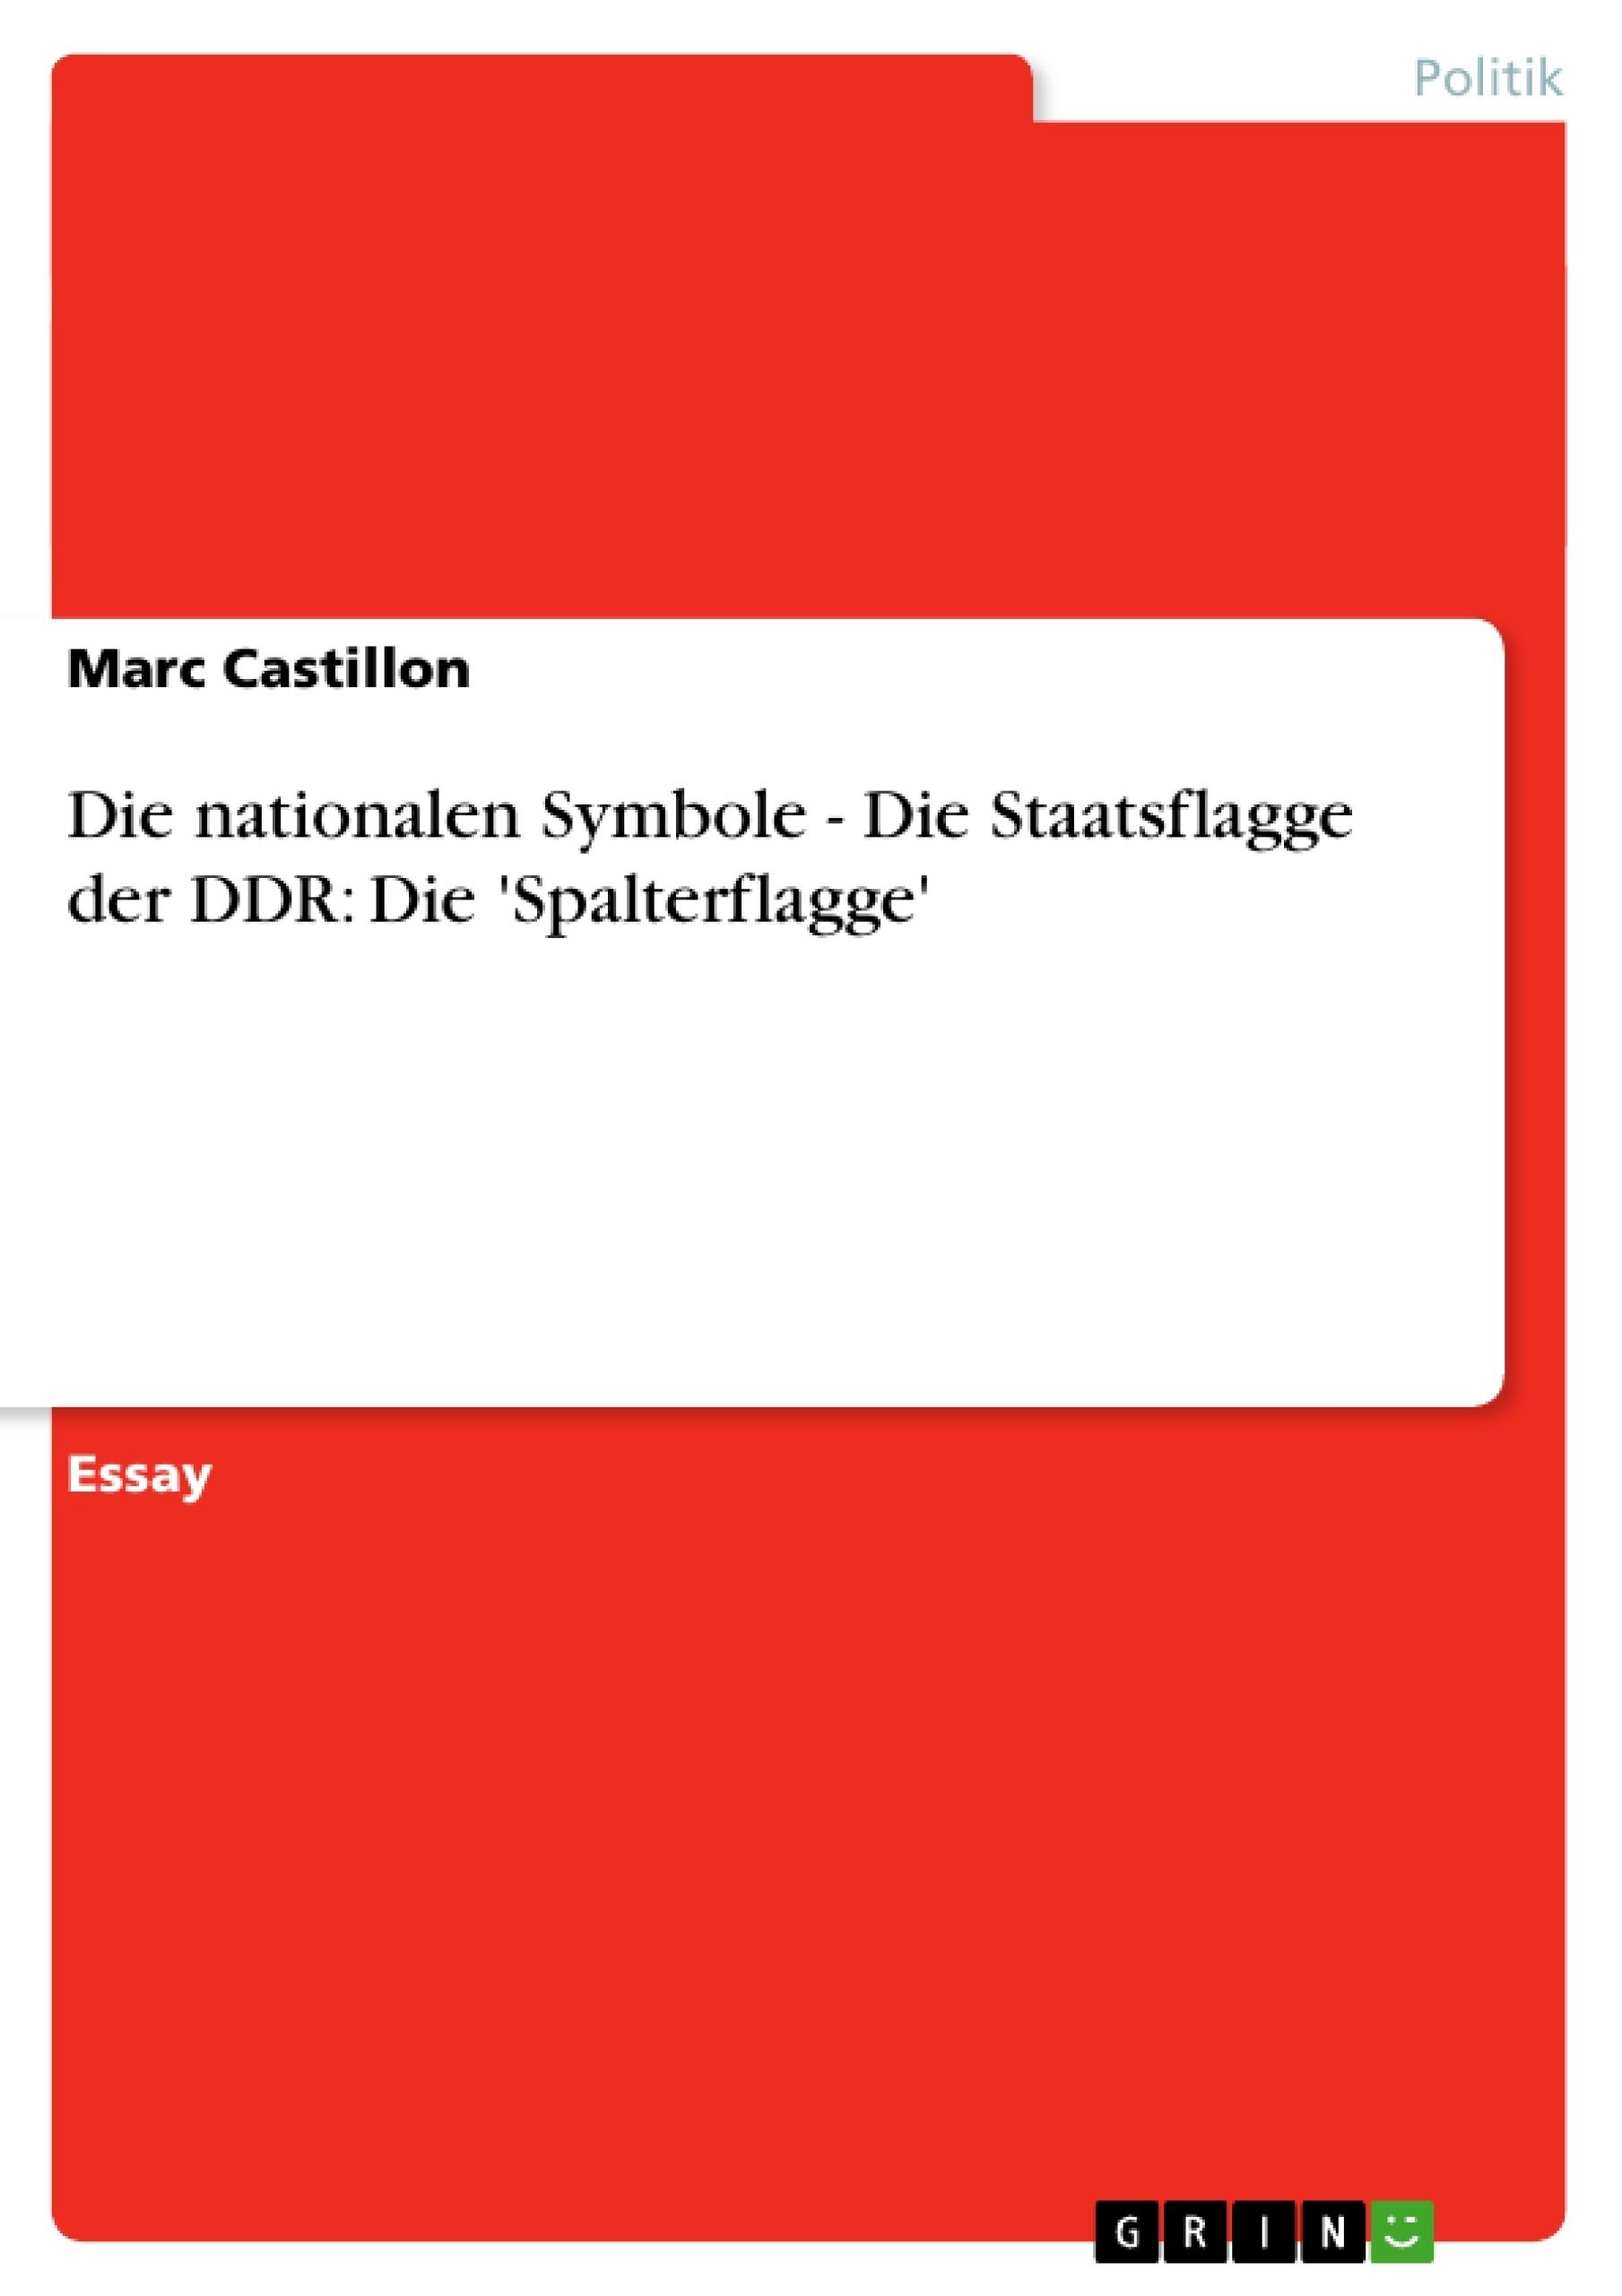 Titel: Die nationalen Symbole - Die Staatsflagge der DDR: Die 'Spalterflagge'